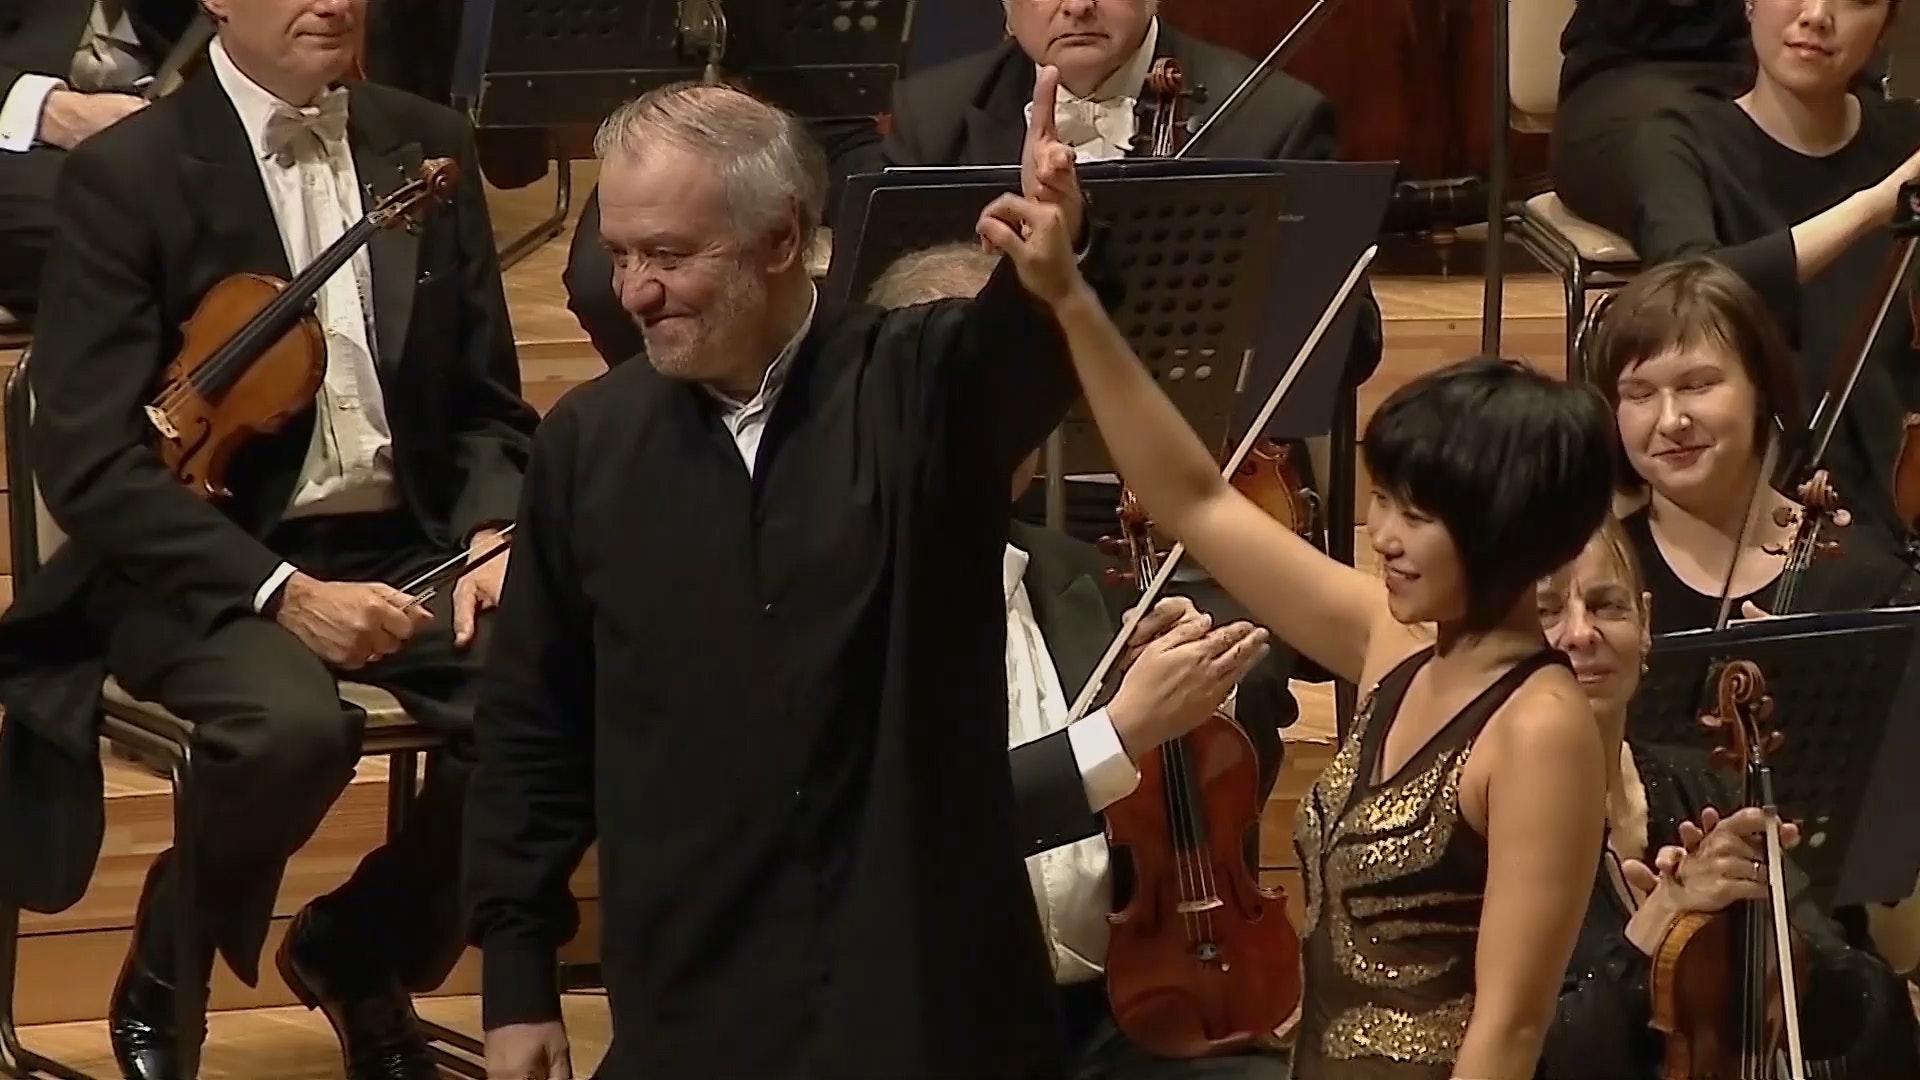 #MPhil125 Valery Gergiev dirige Brahms et Mahler – Avec Yuja Wang